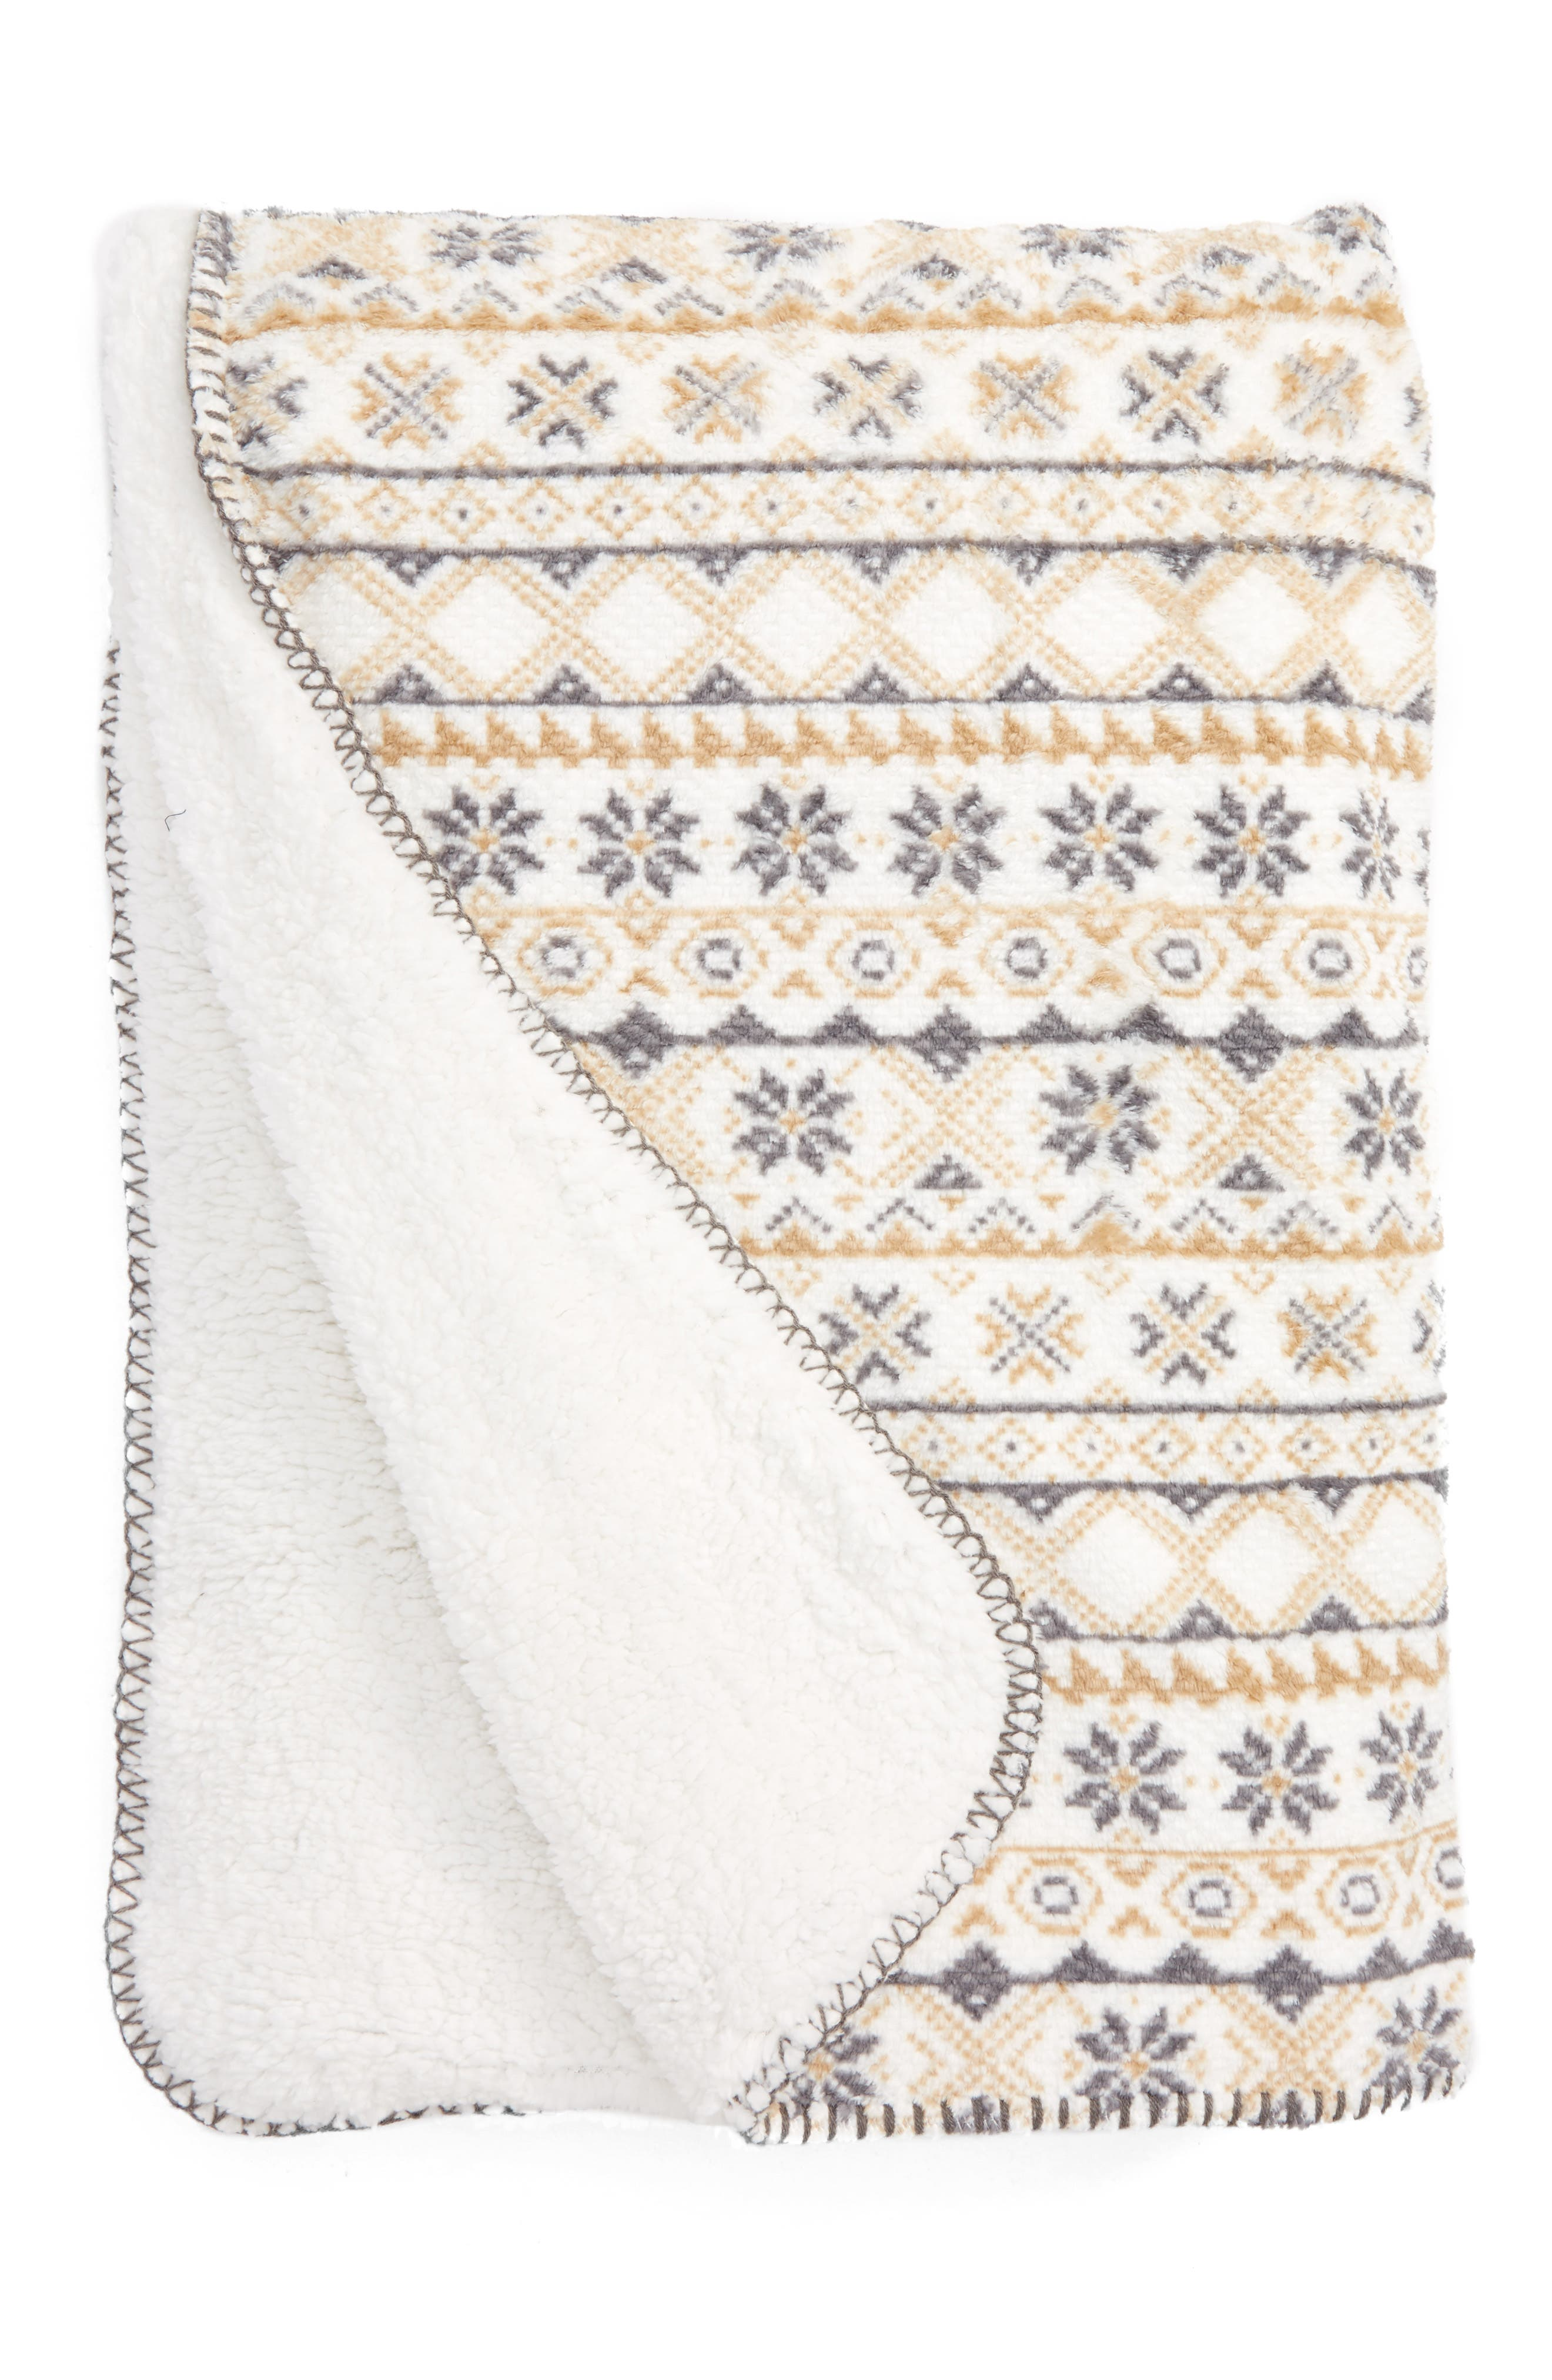 Fair Isle Print Faux Shearling Blanket,                             Main thumbnail 1, color,                             900